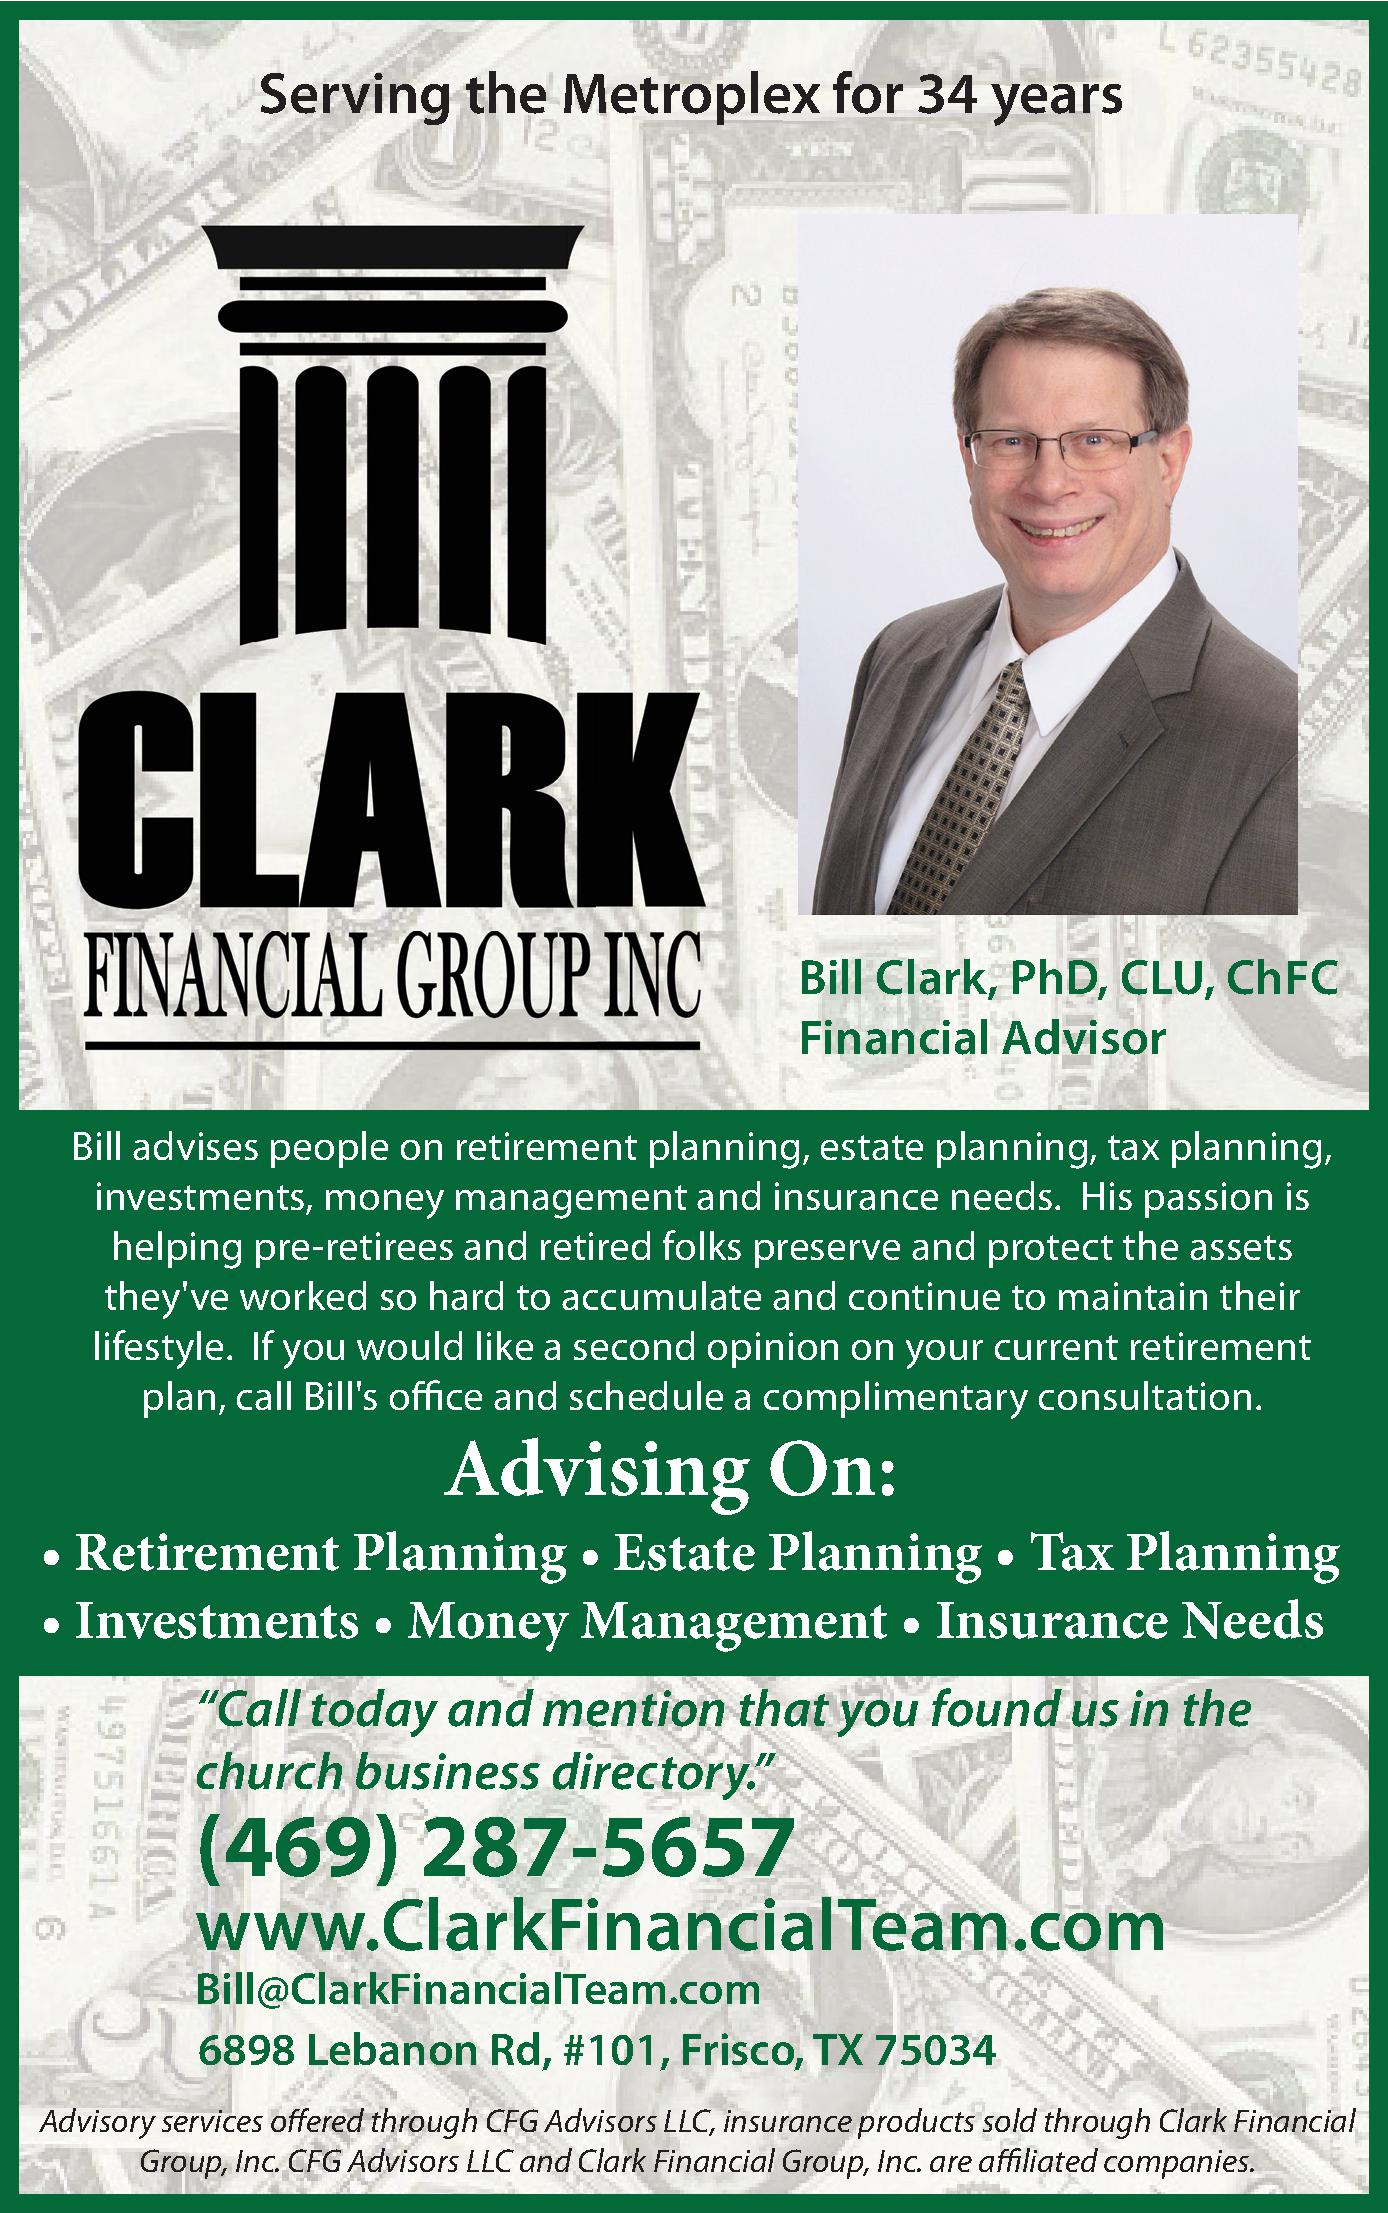 Clark Financial Group